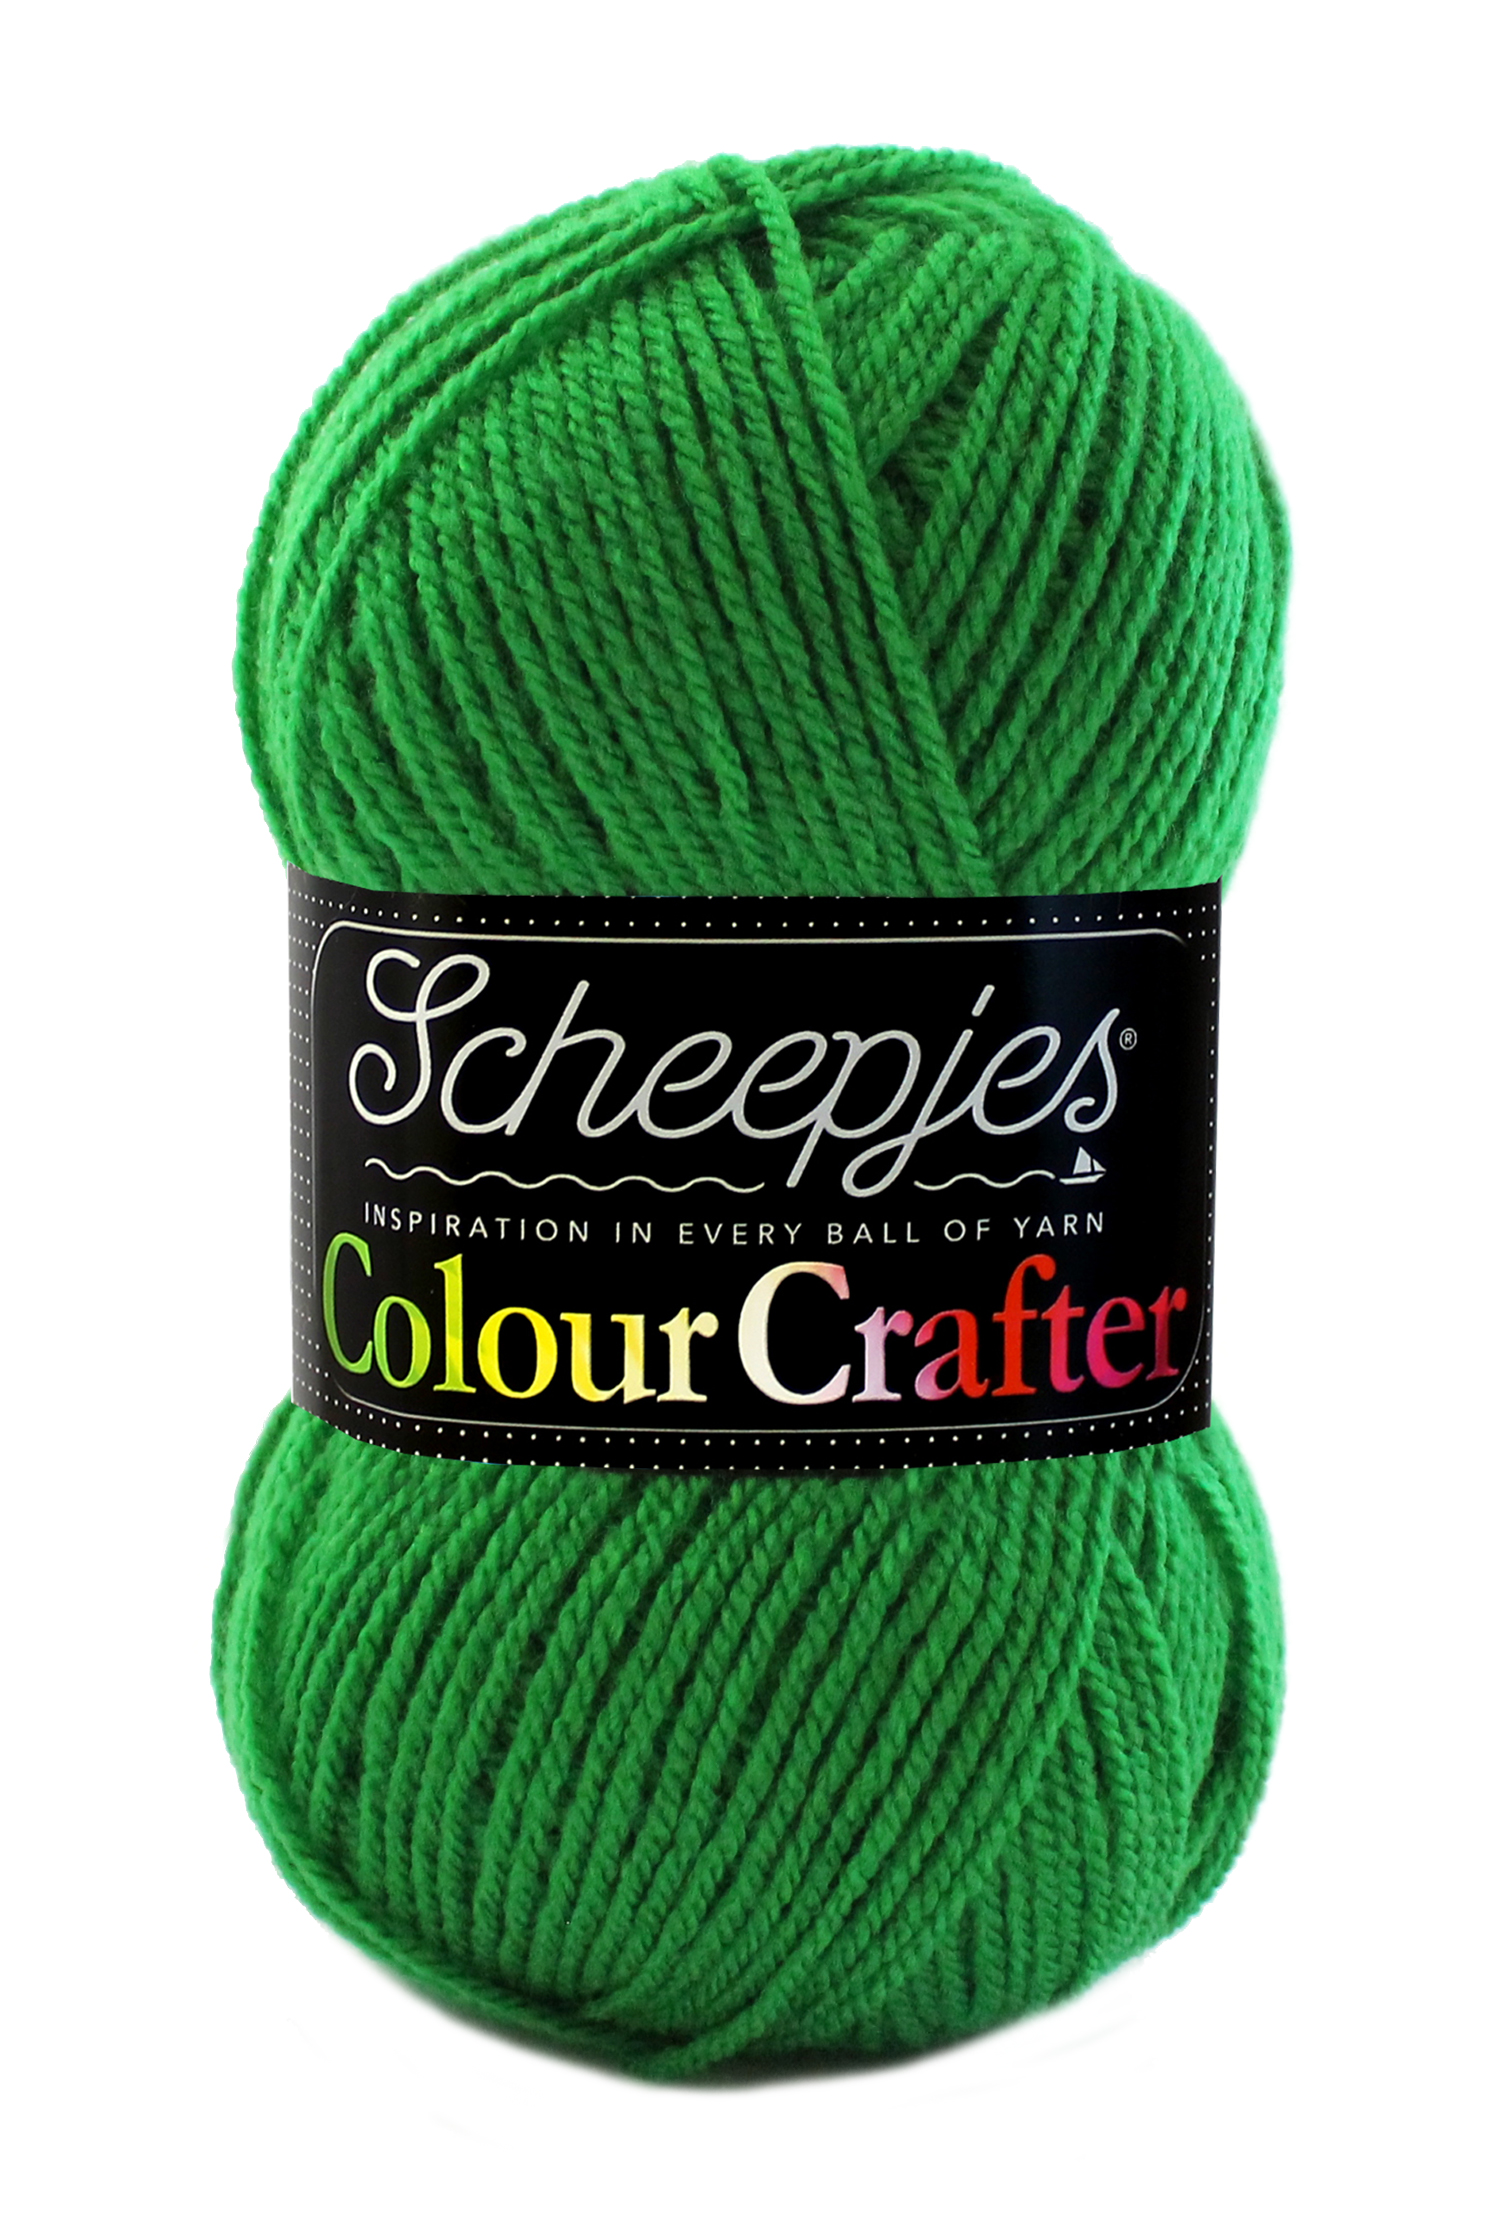 Scheepjes Colour Crafter – Franeker 1826 | garenhuisukeus.nl